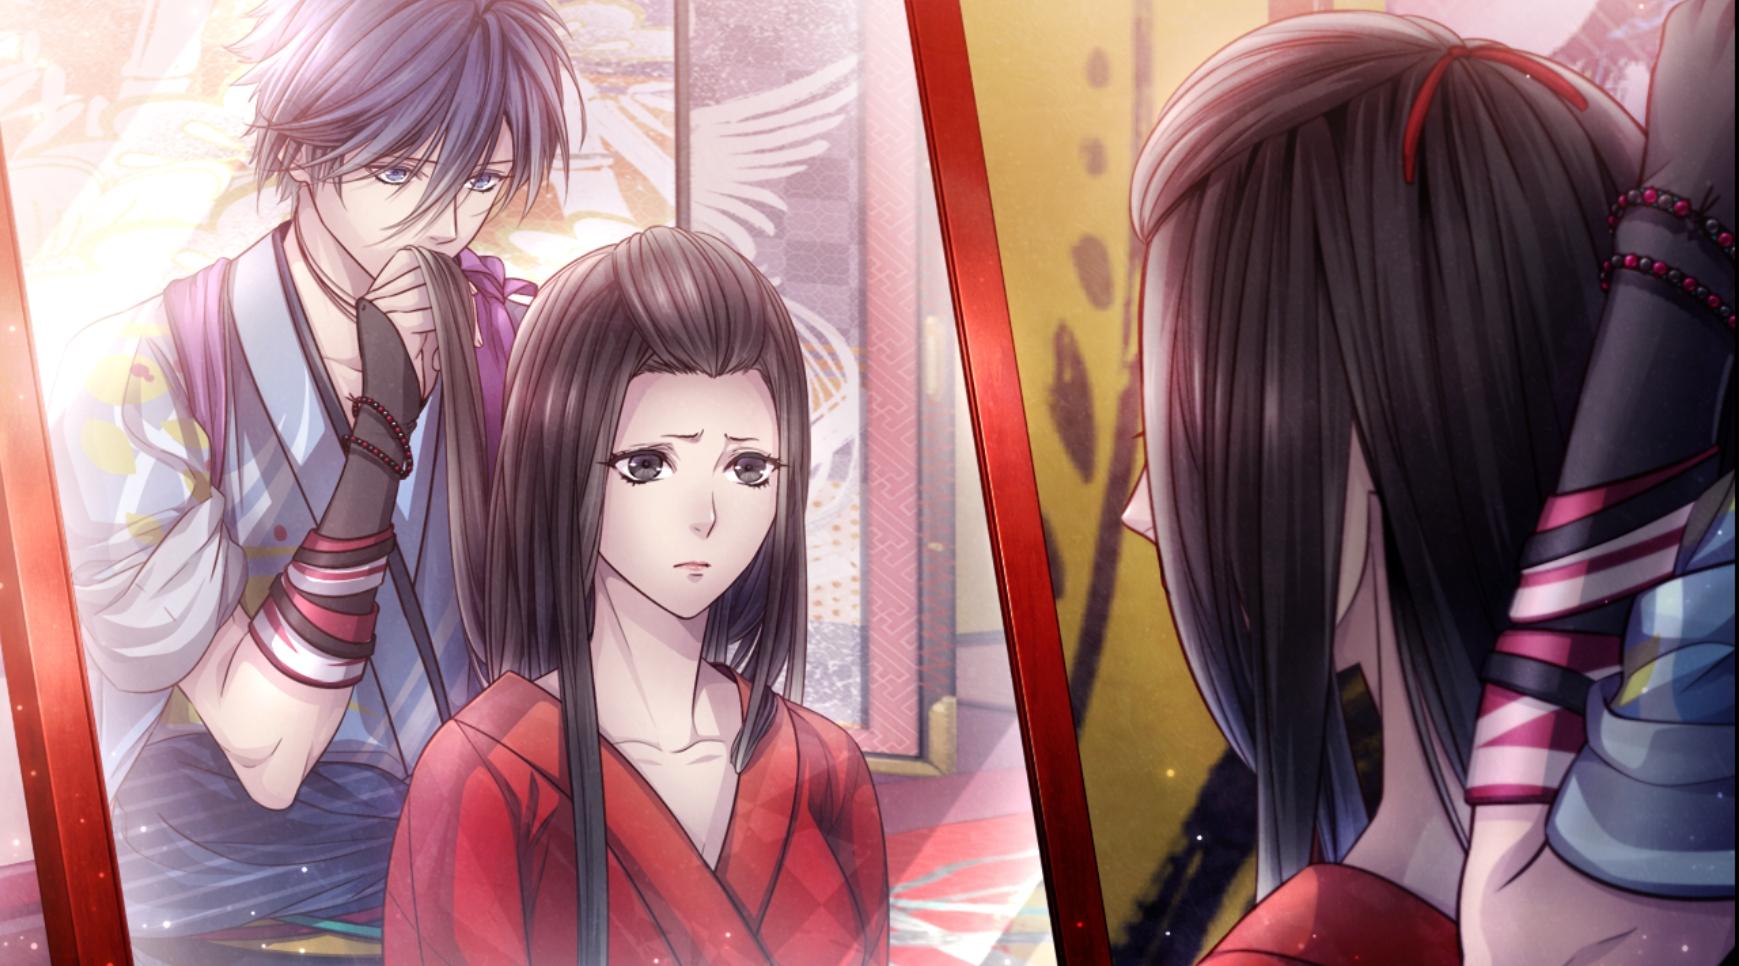 yoshiwara higanbana characters